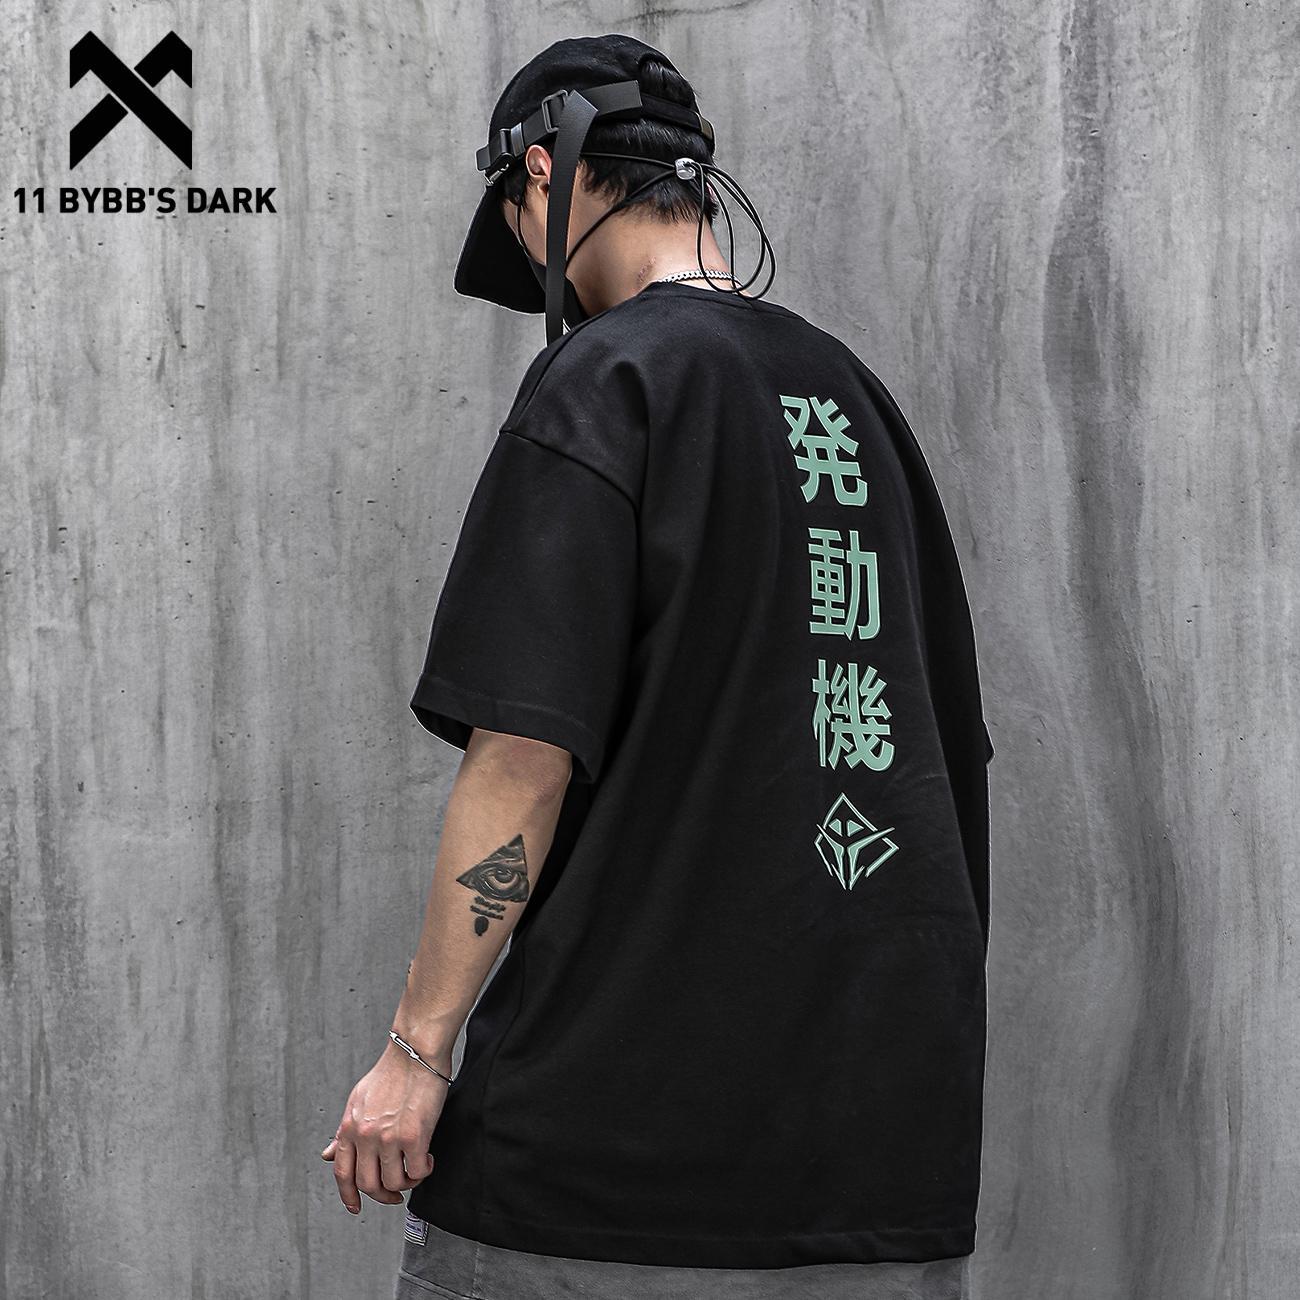 11 BYBB'S DARK 2021SS Devil Embroidery Print Harajuku Tshirts Summer Hip Hop T-Shirt Men punk Cotton Loose Short Sleeve Shirts